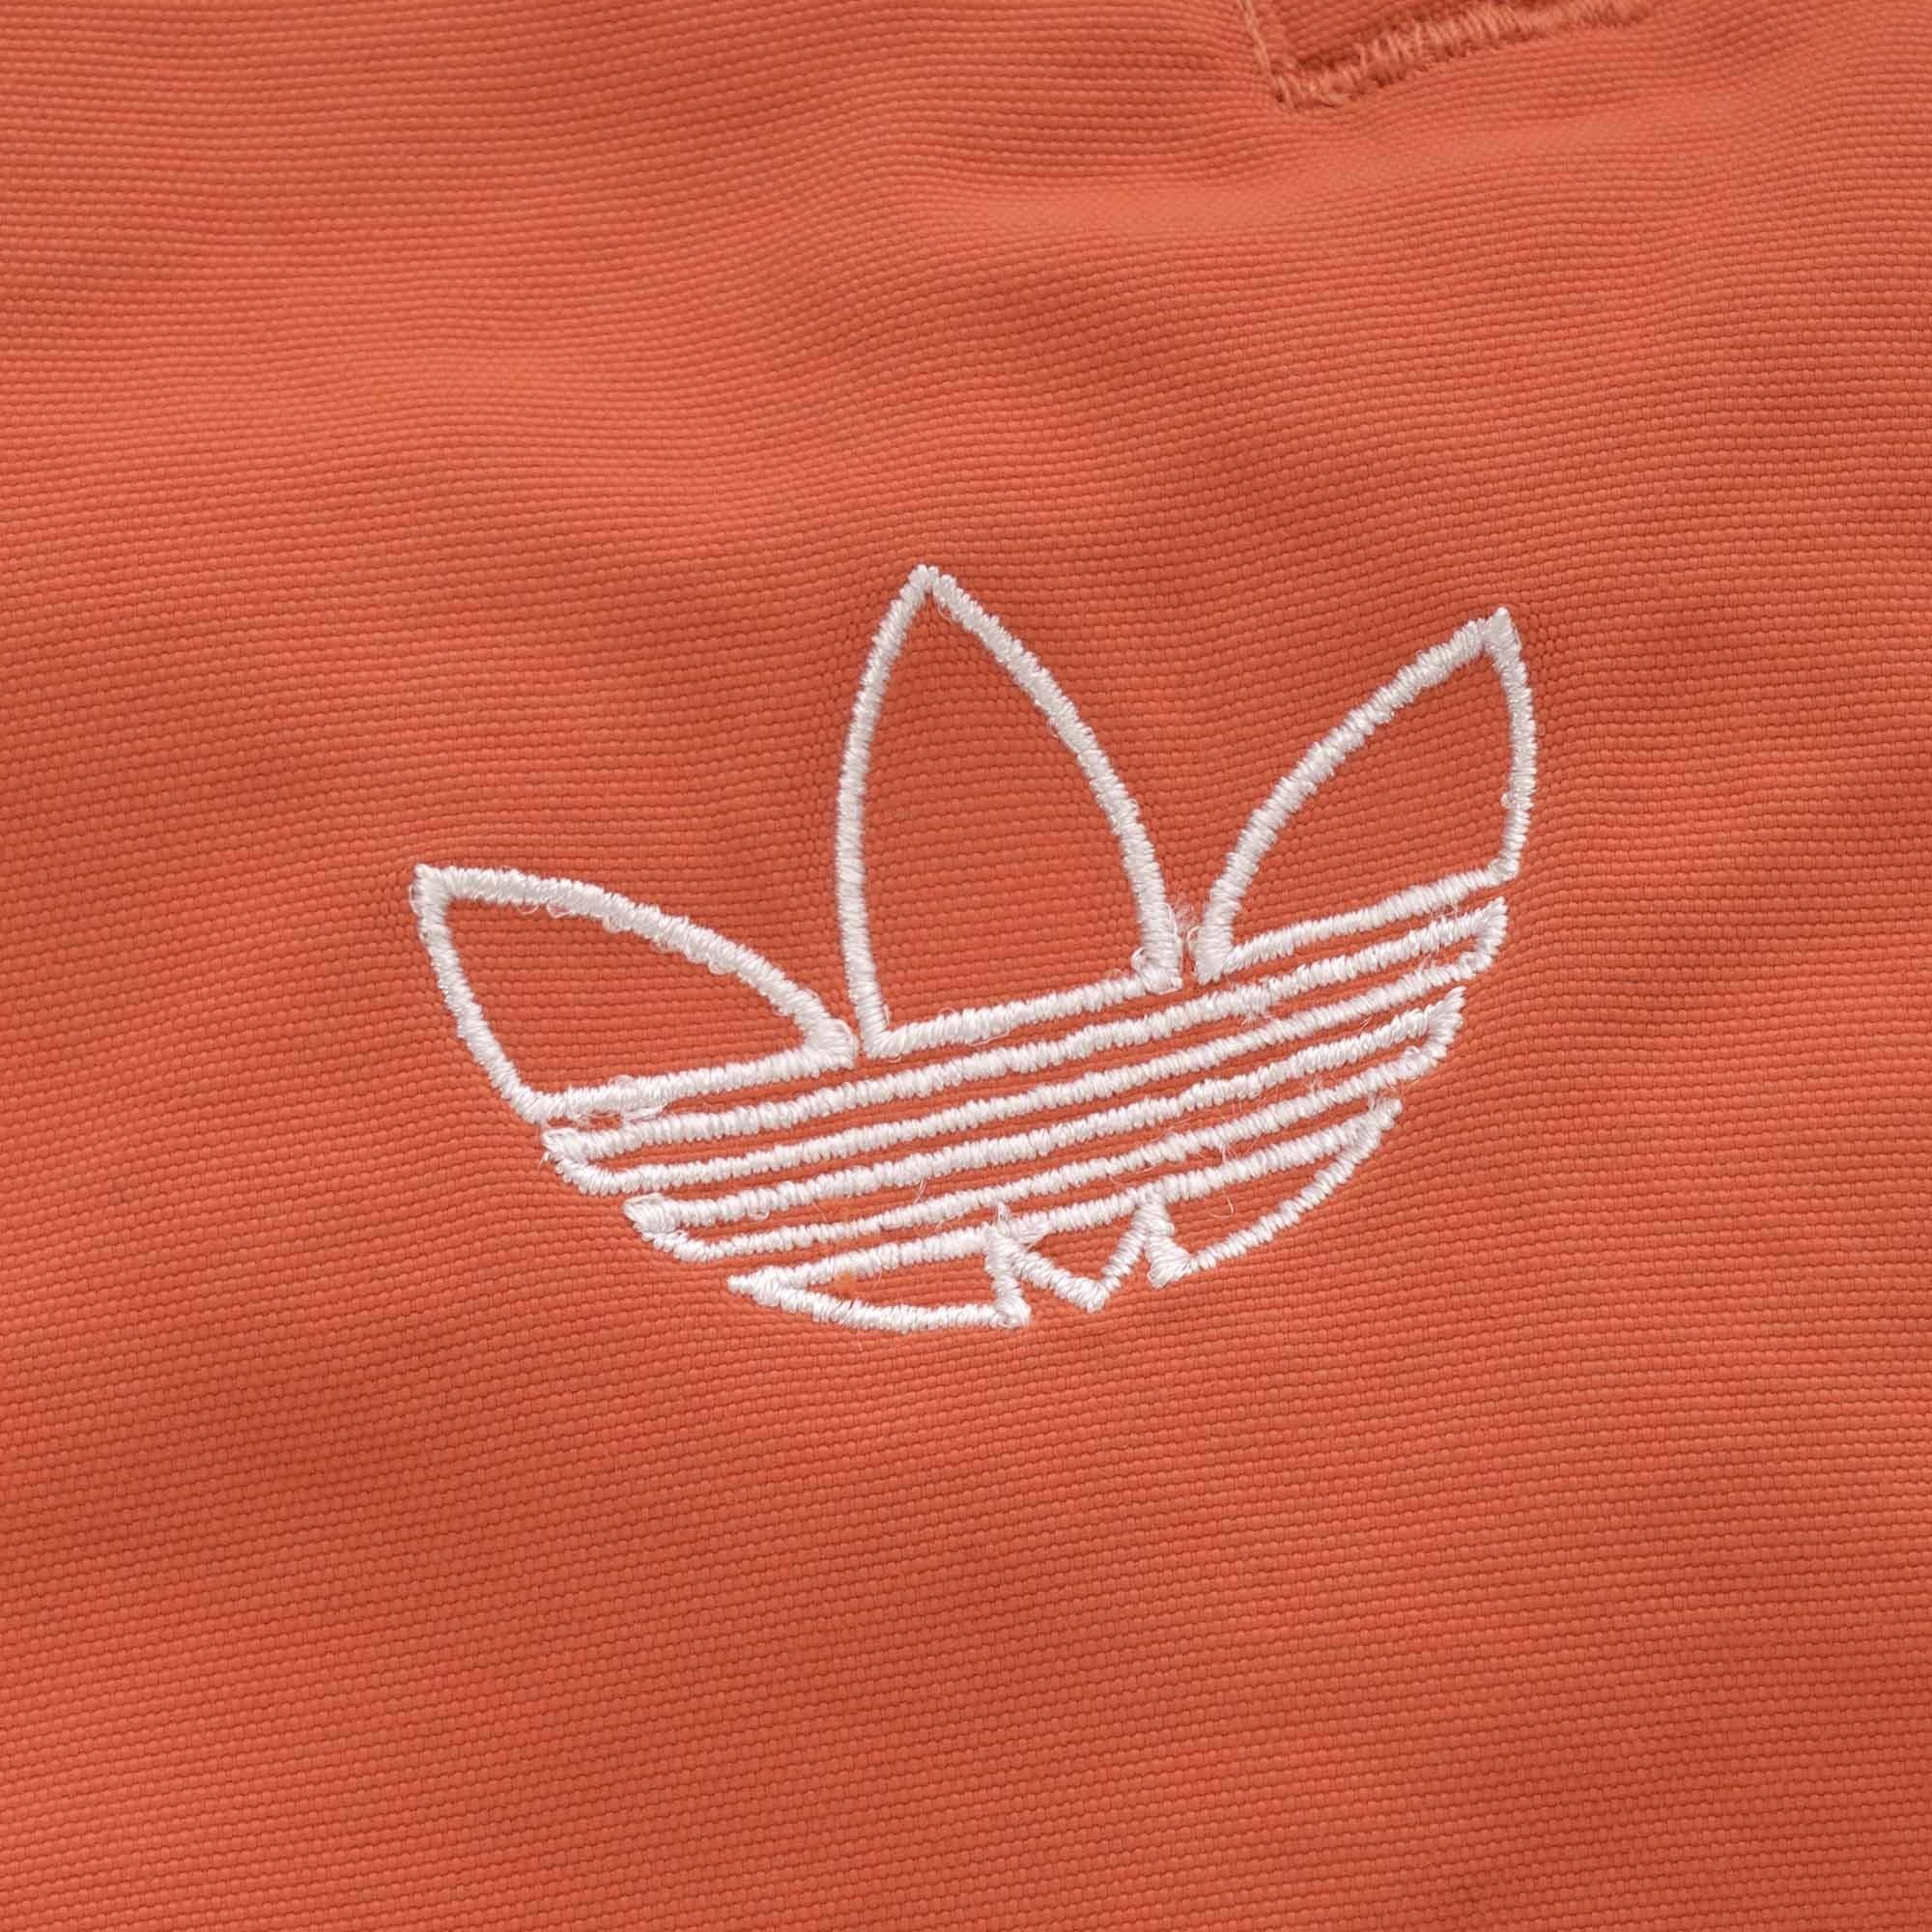 02e1d2f5fe8 adidas Originals Woven Three Stripe Warm Up Pant - Raw Amber for Men ...